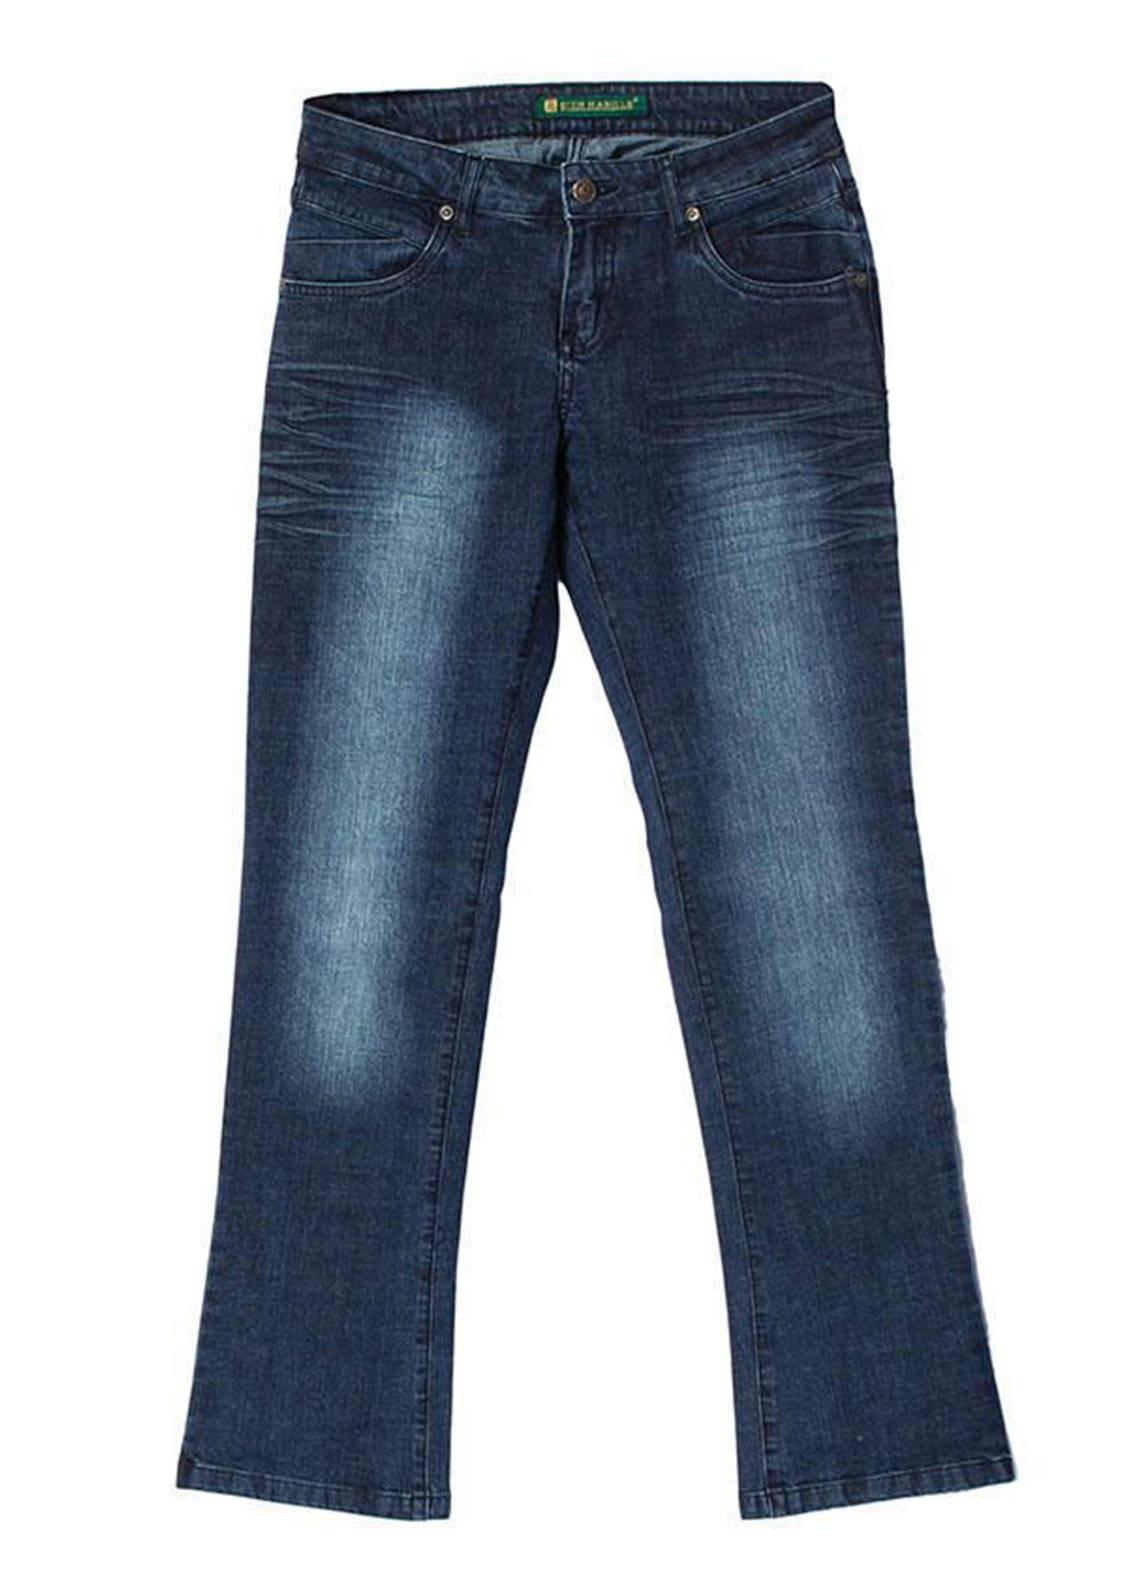 Bien Habille Jeans Casual Fit Blue Sun Blast